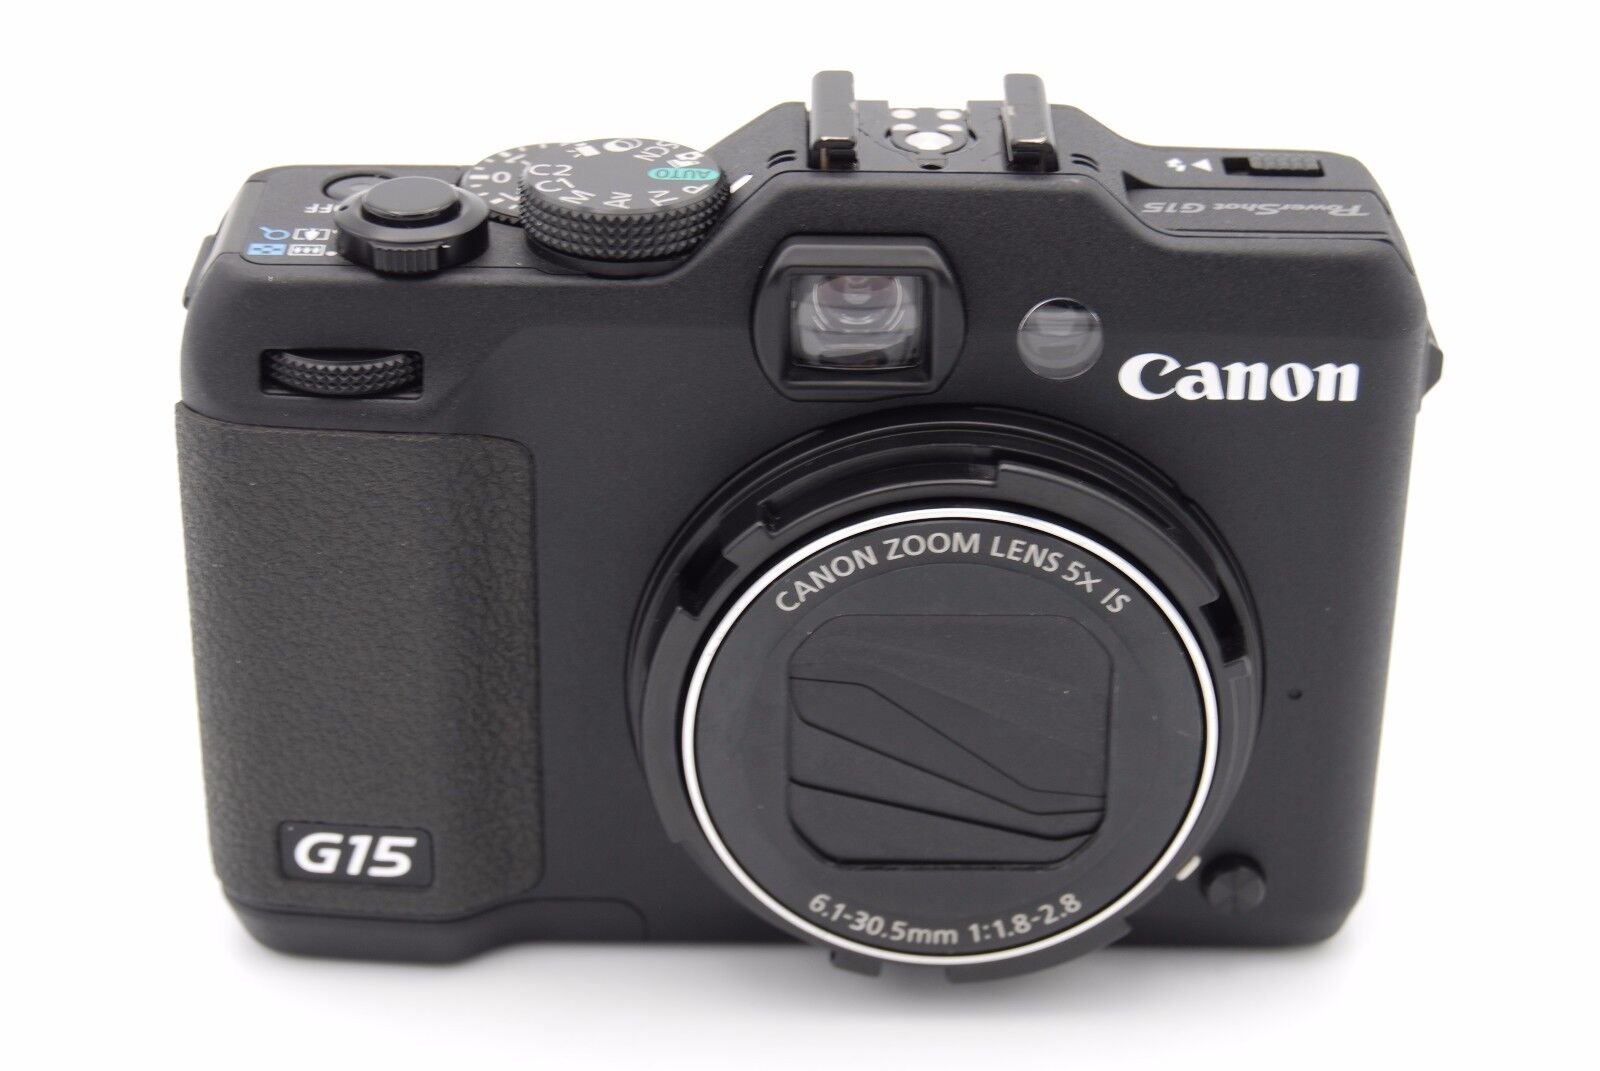 canon powershot g15 12 1mp 3 39 39 screen 5x zoom digital camera 13803156805 ebay. Black Bedroom Furniture Sets. Home Design Ideas